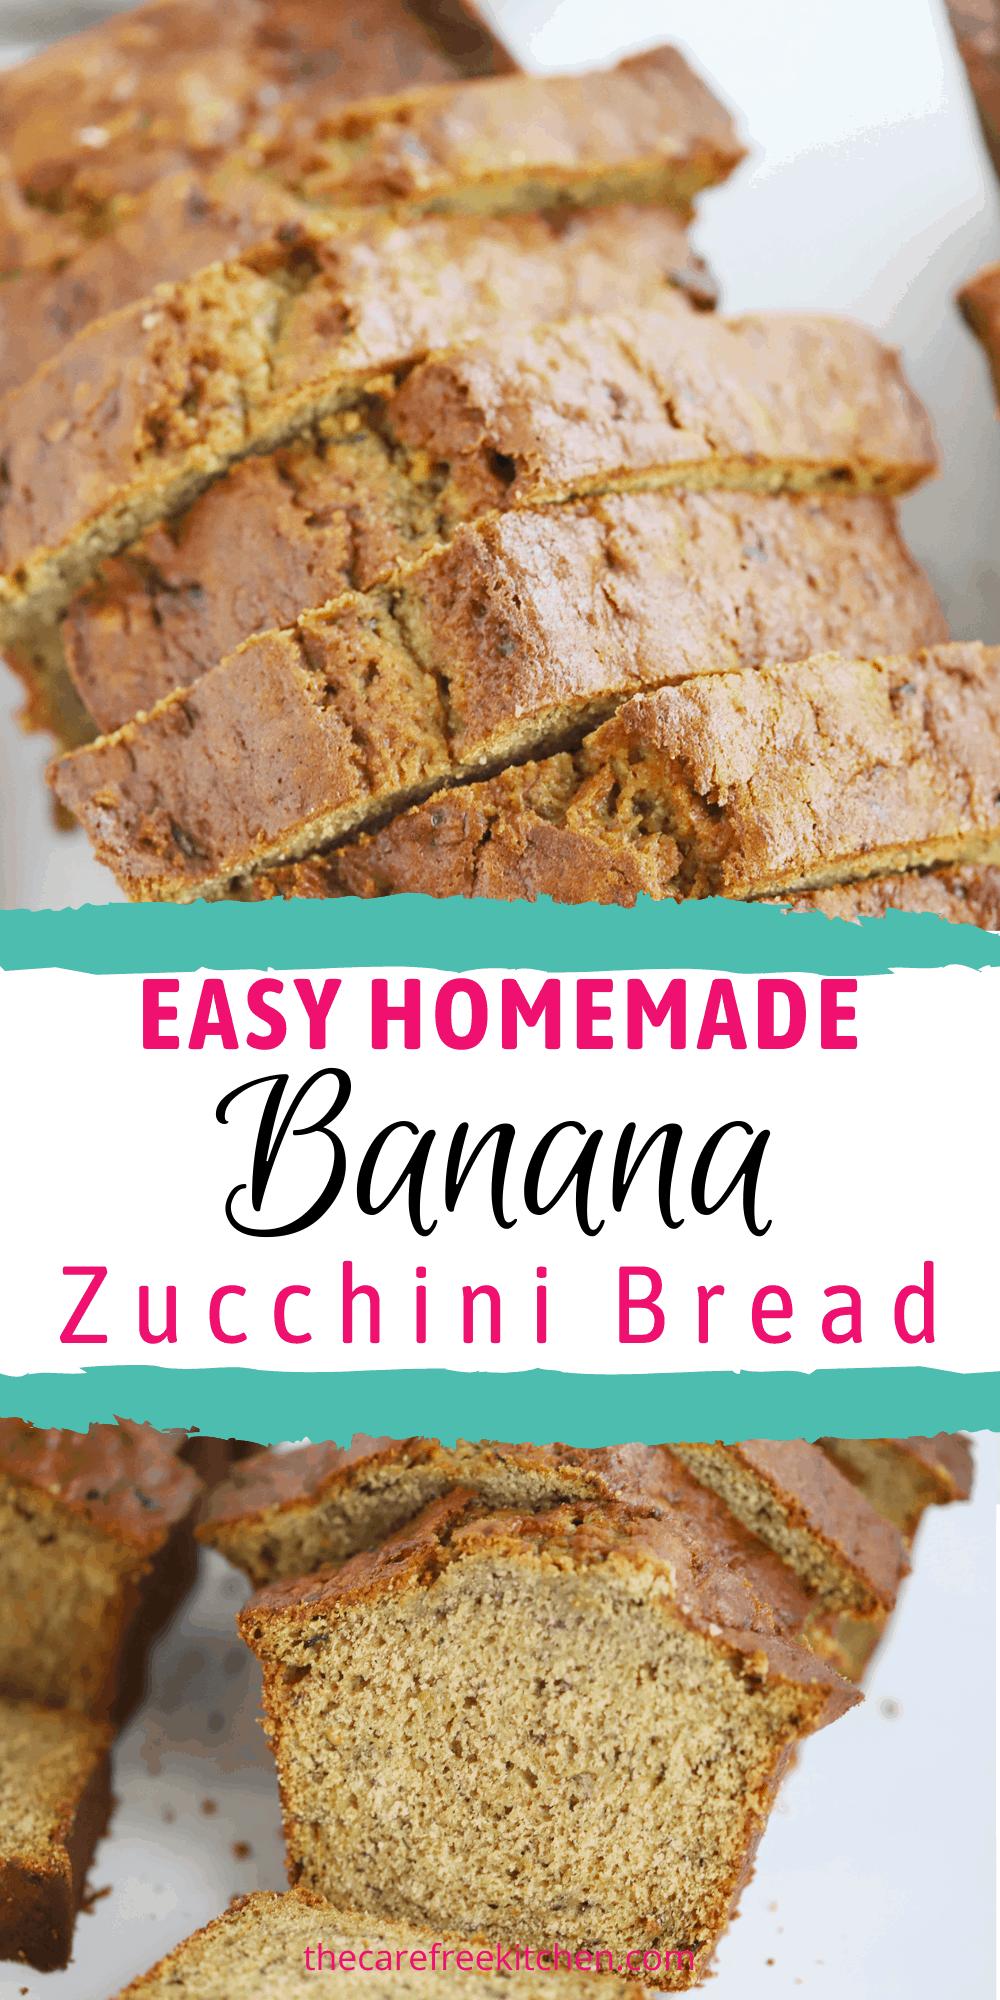 Pinterest pin for Zucchini Banana Bread